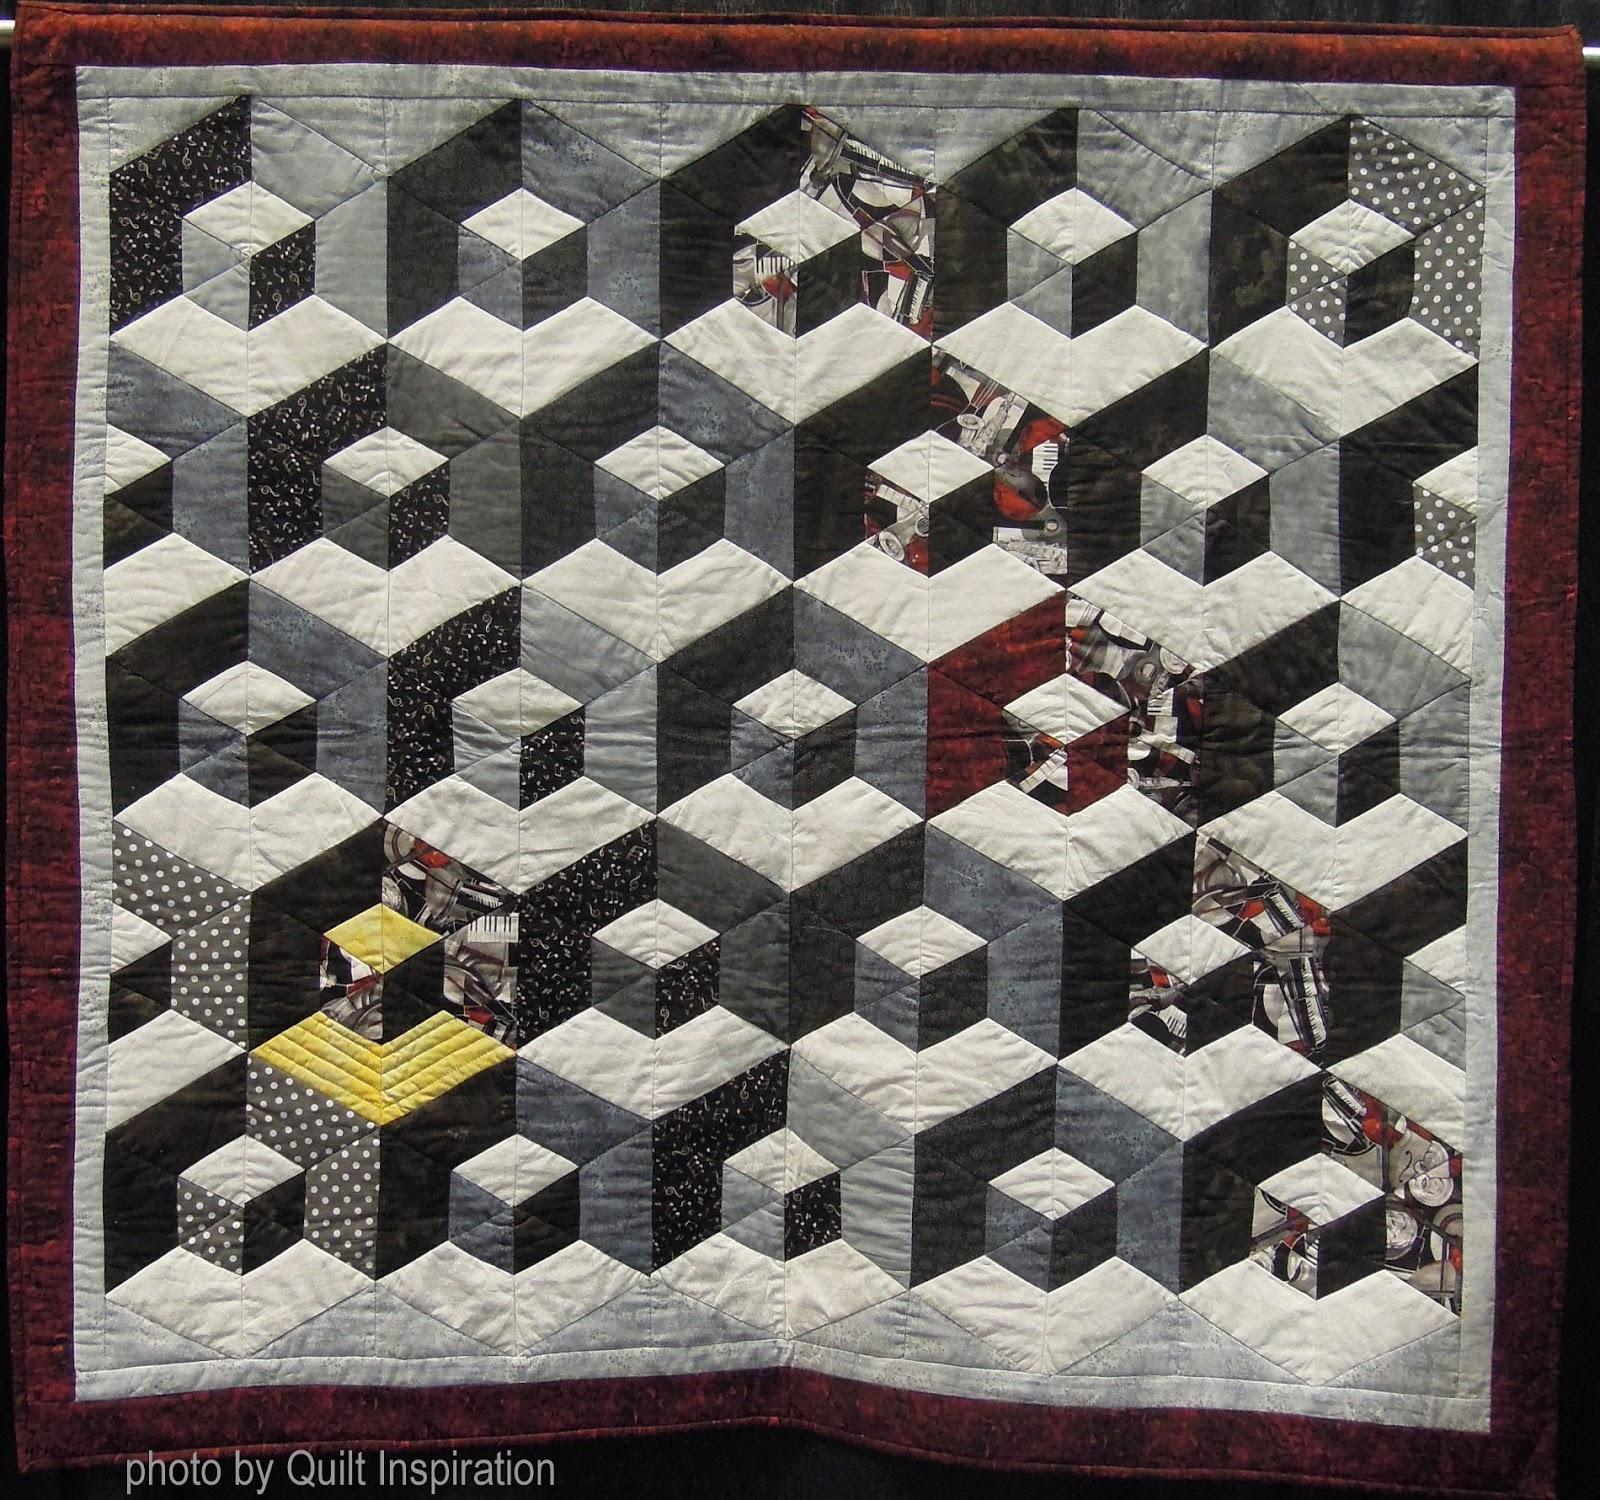 Quilting Patterns Tumbling Blocks : Quilt Inspiration: Tumbling Blocks revisited